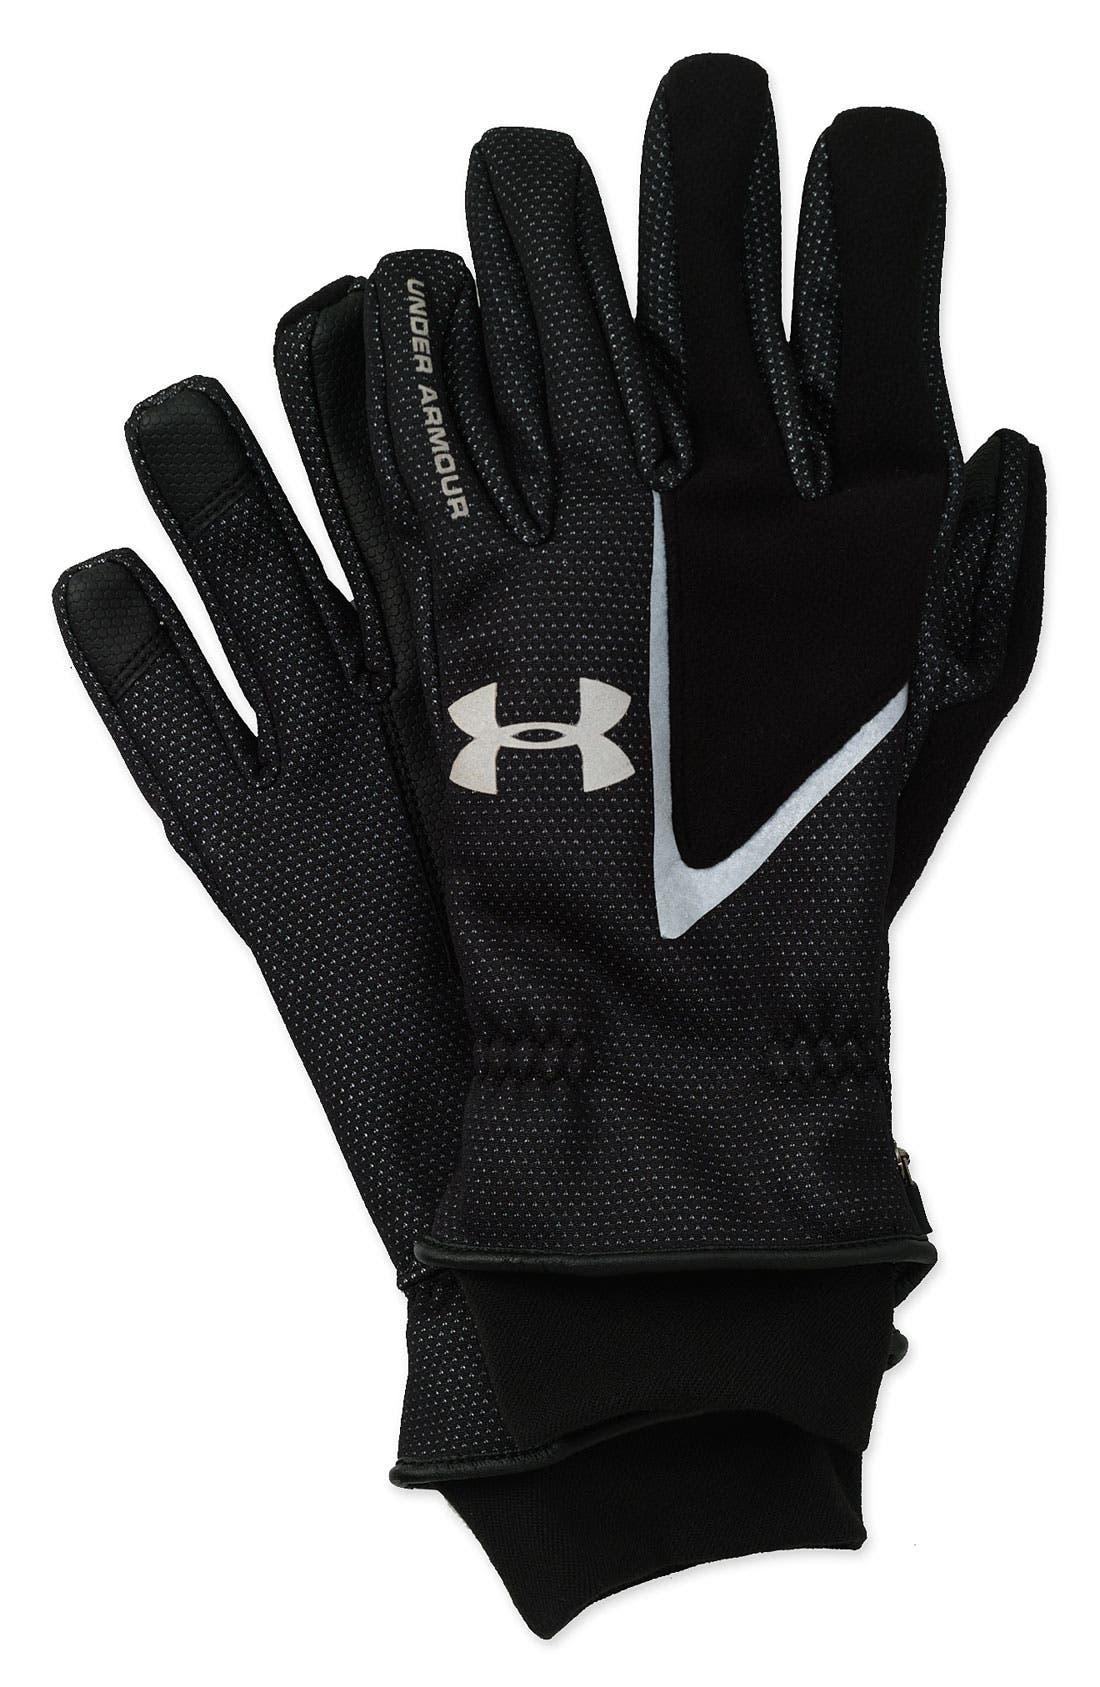 Main Image - Under Armour Key Pocket ColdGear® Gloves